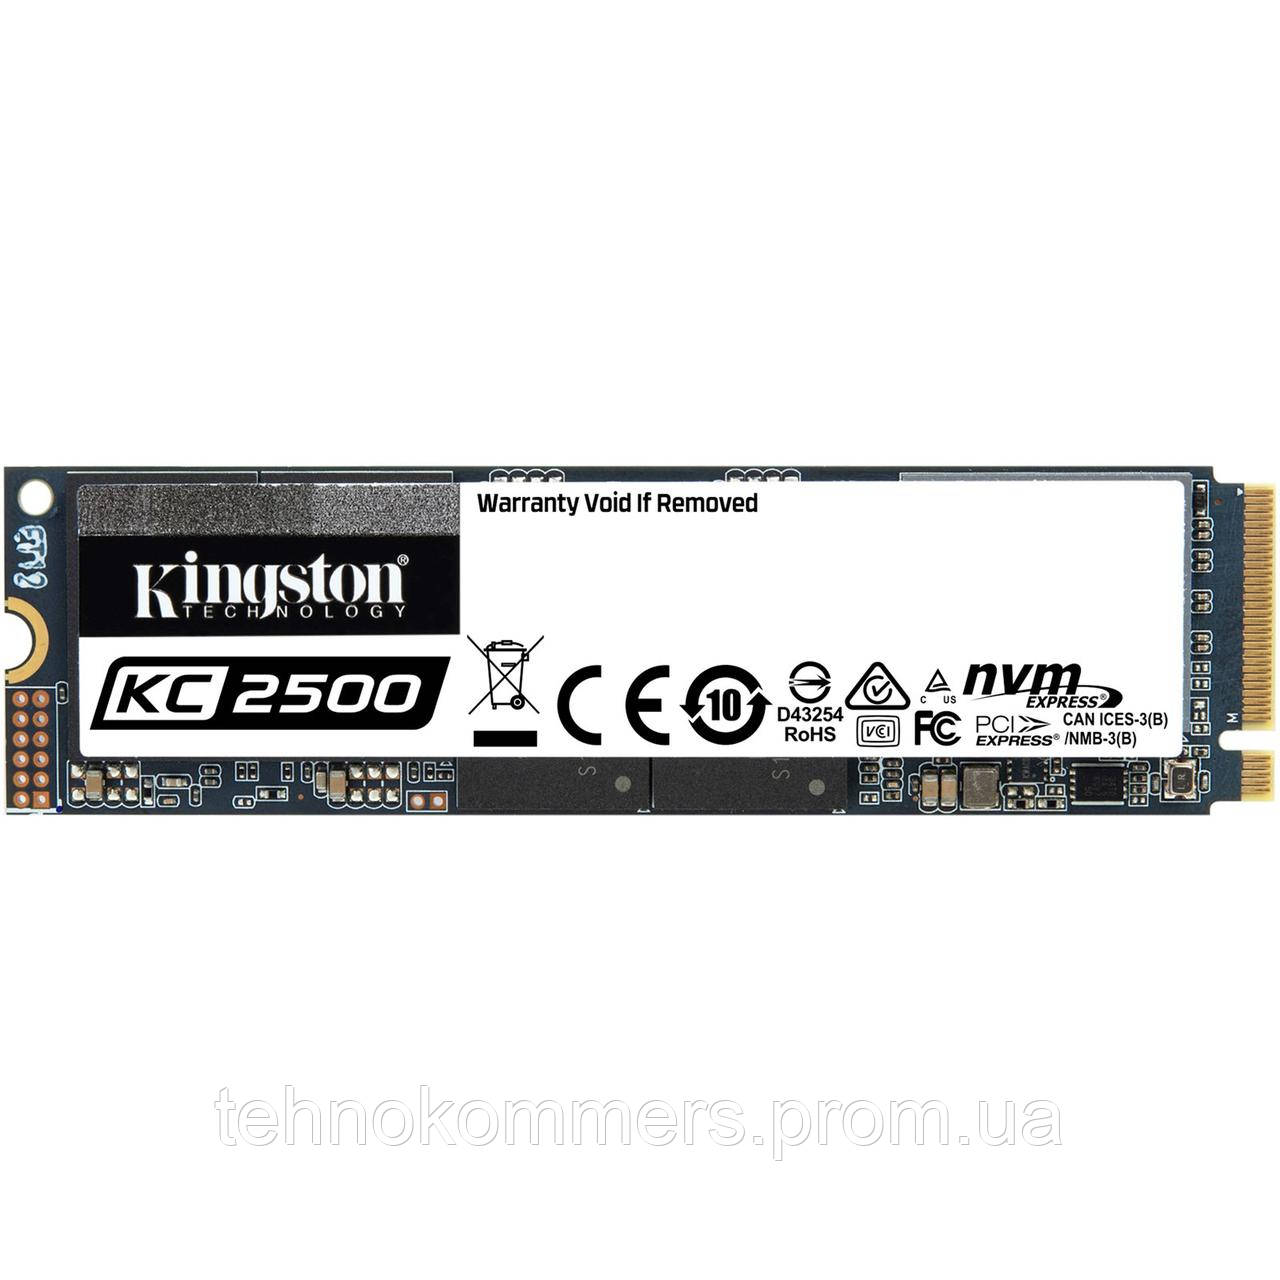 Накопичувач SSD Kingston KC2500 1024GB M.2 PCI Express 3.0x4 3D NAND TLC